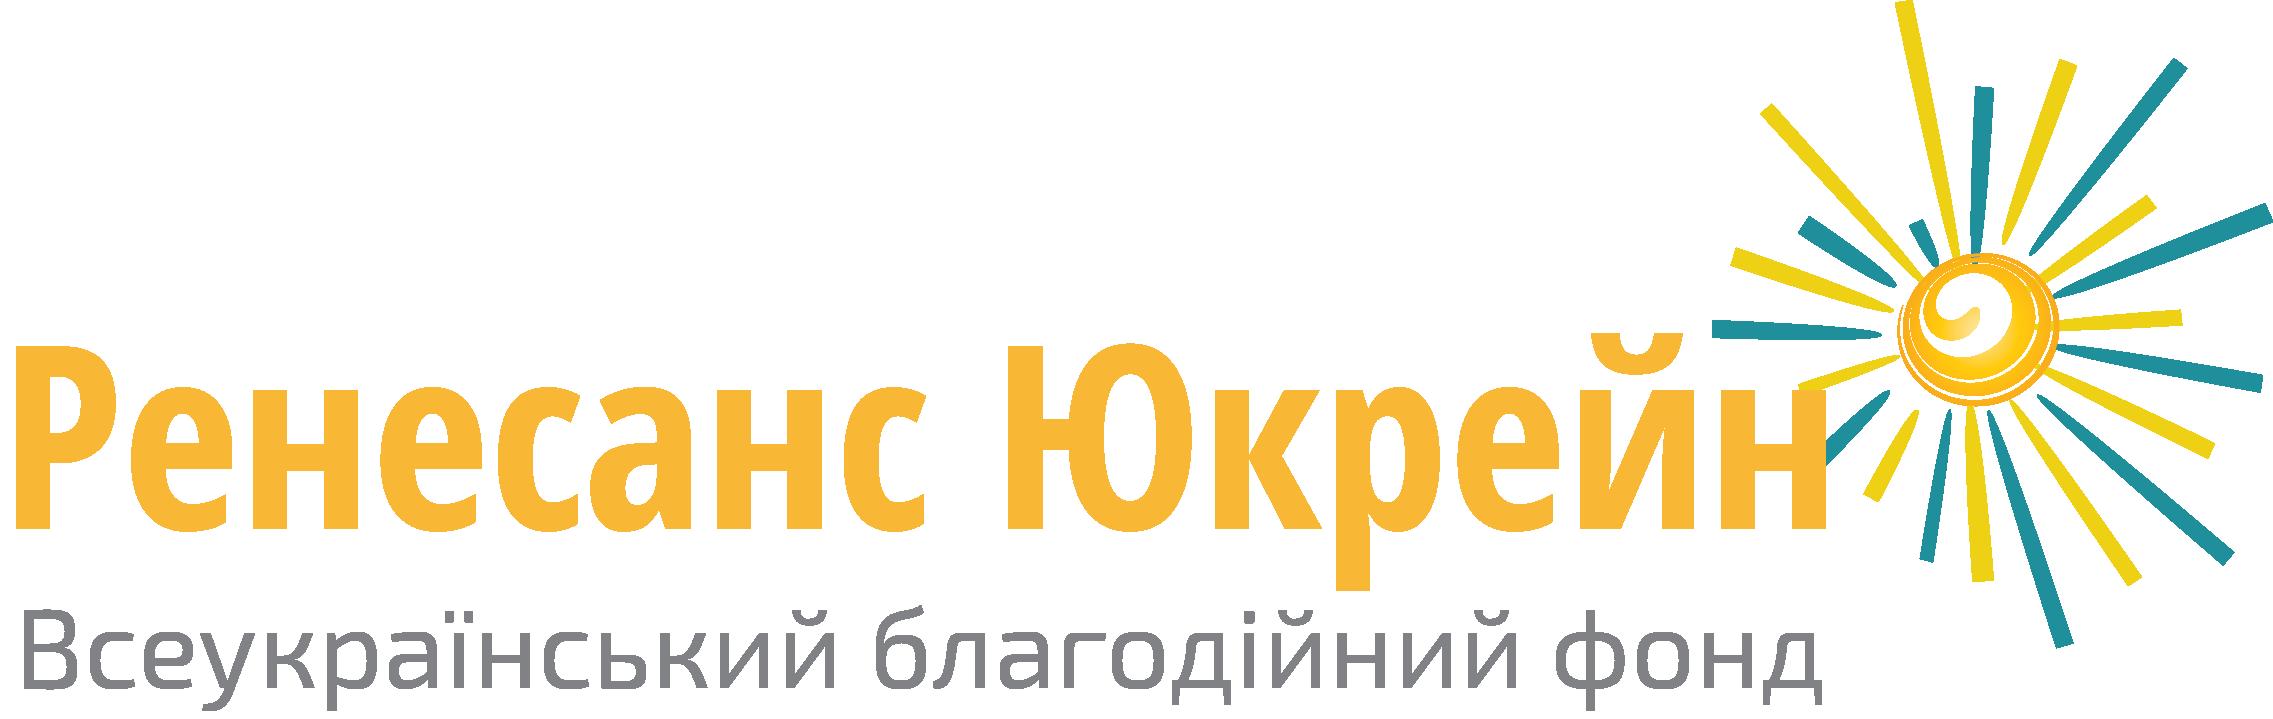 Всеукраїнський благодійний фонд